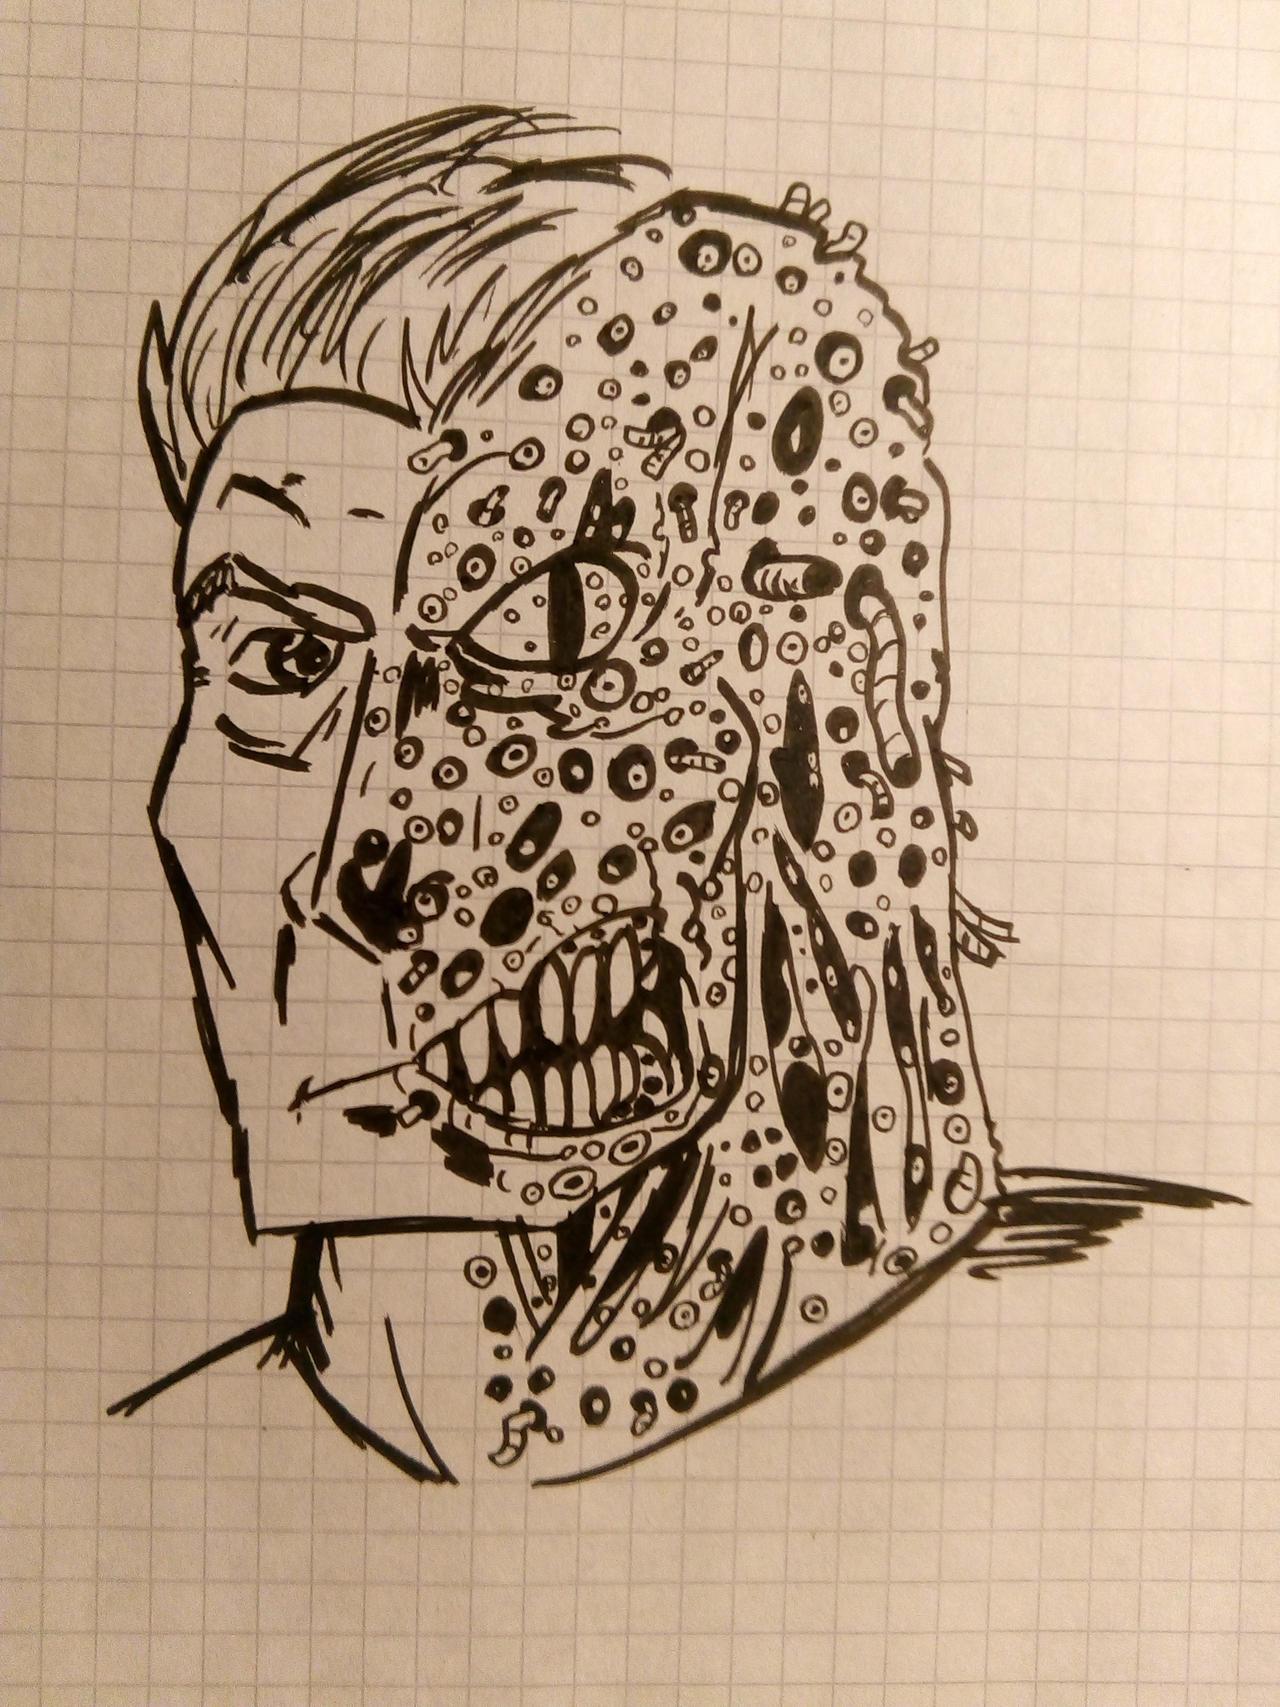 Trypophobia Two Face By Julianivorobotnik On Deviantart